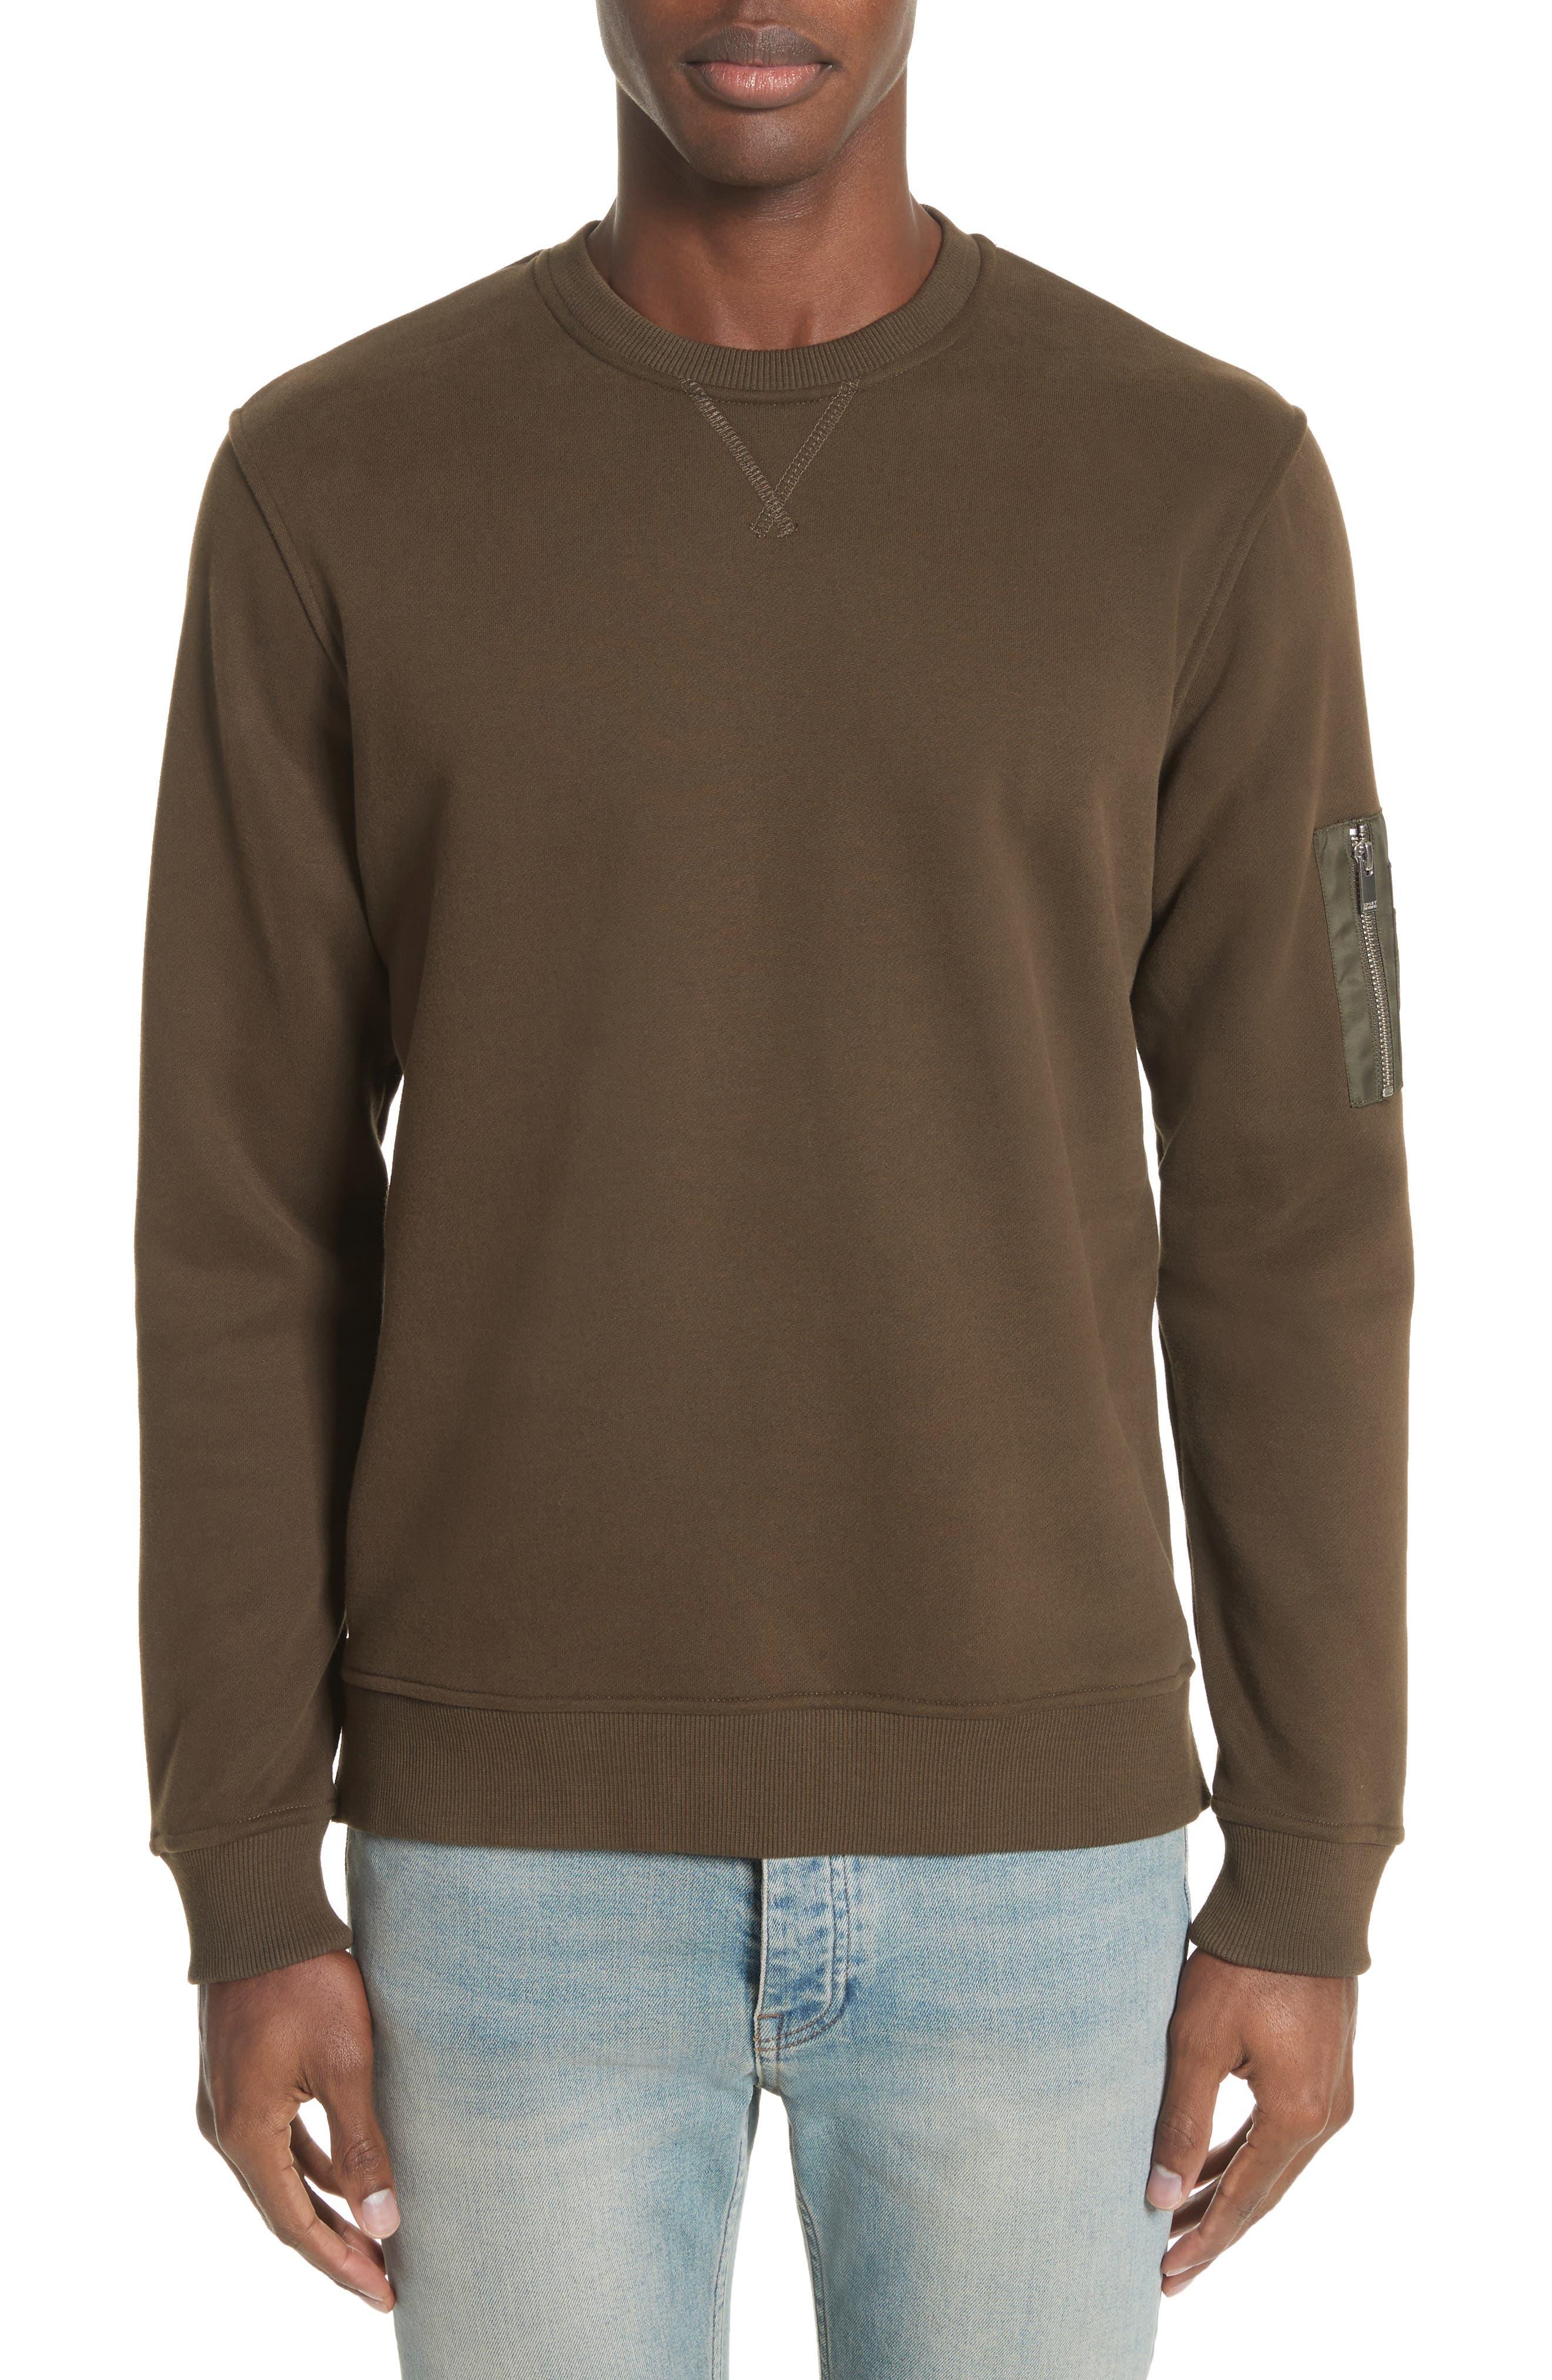 Main Image - The Kooples Crewneck Cotton Sweater